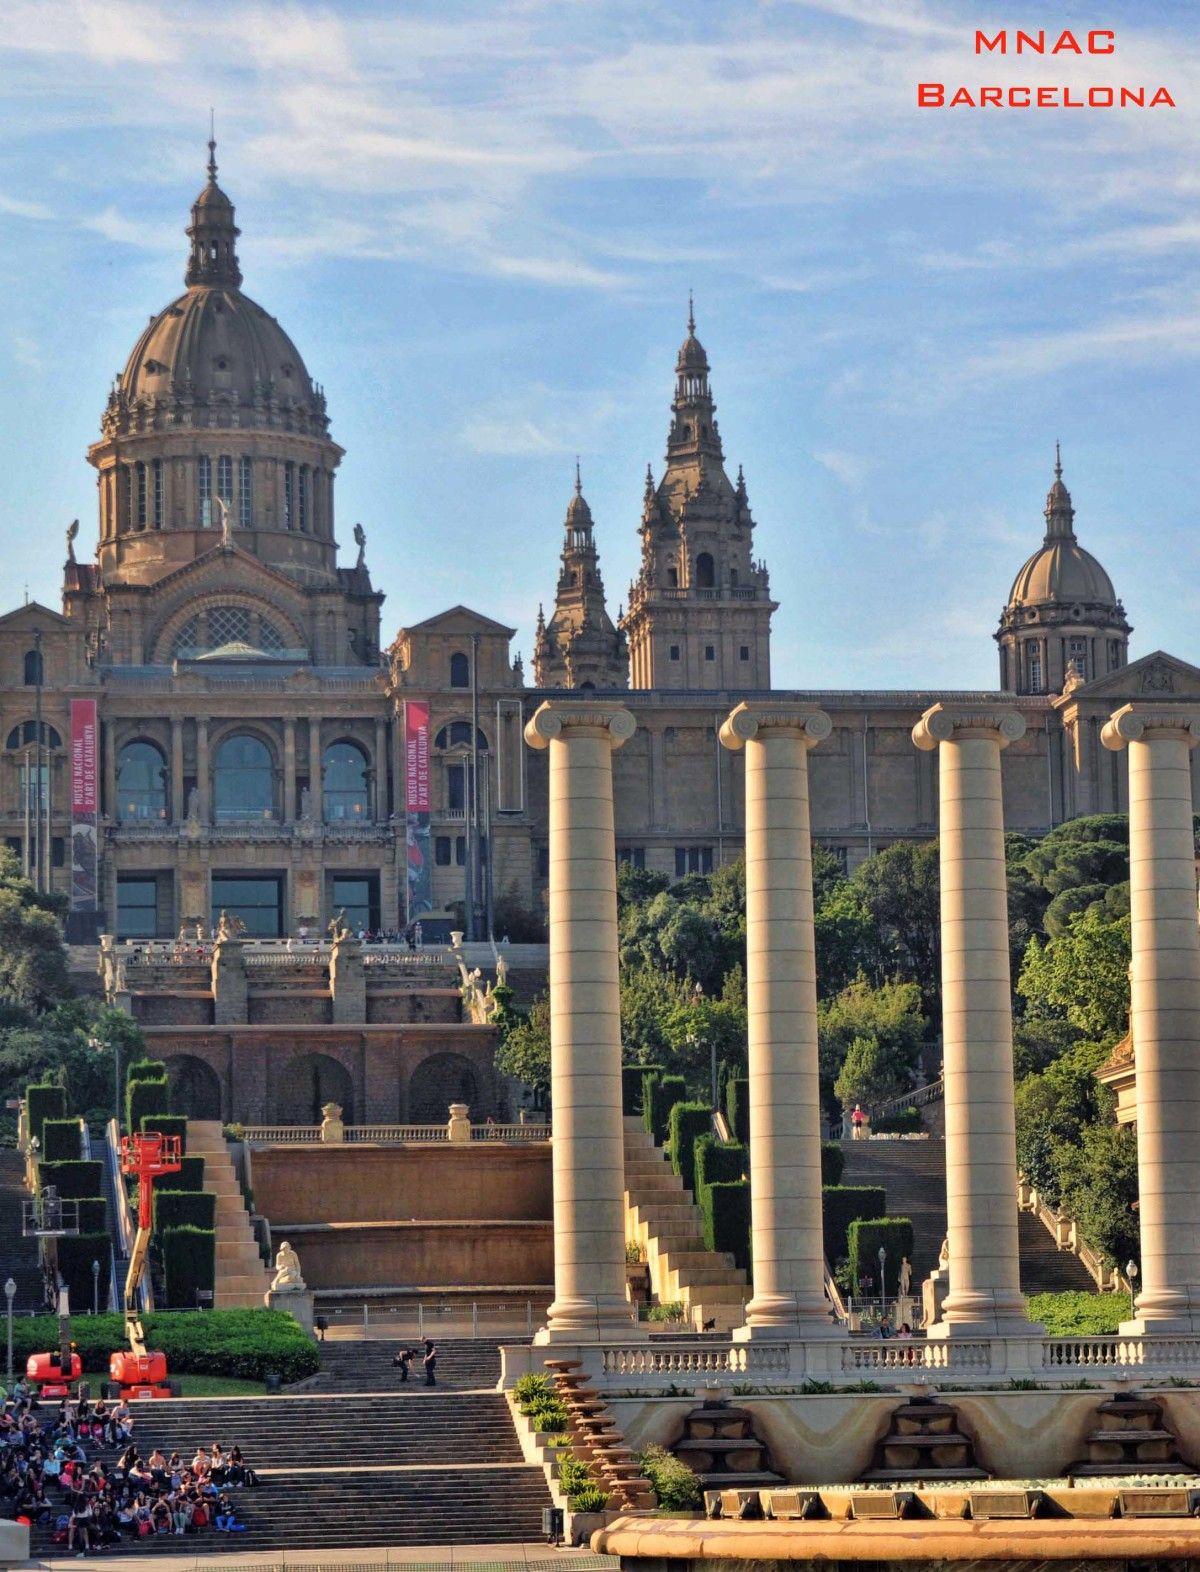 Mnac museo nacional dart de catalunya in barcelona